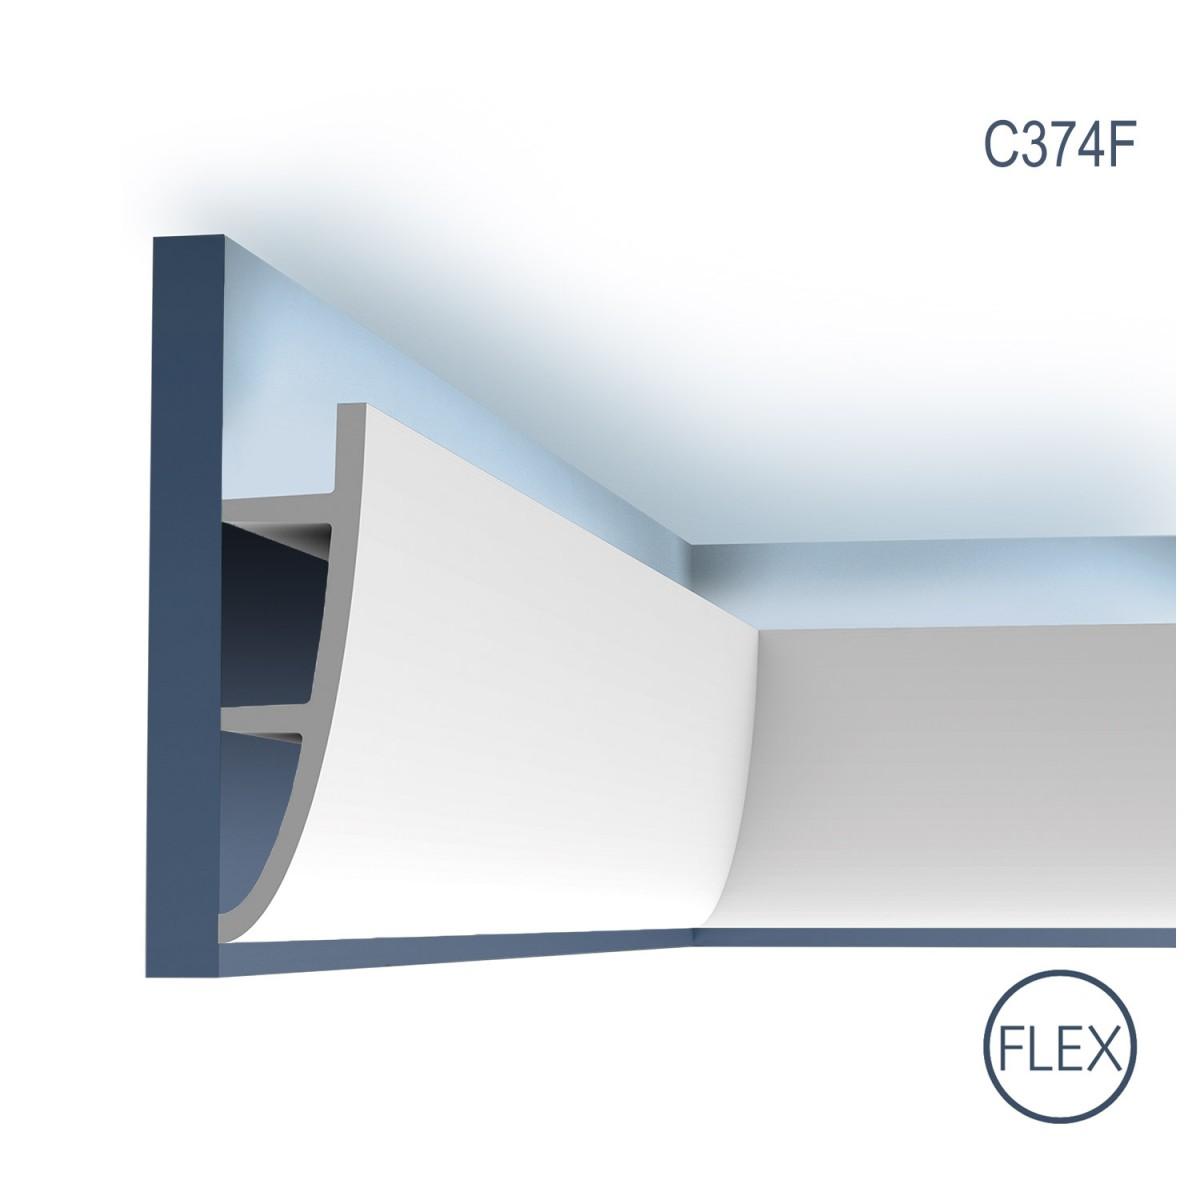 Cornisa Ulf Moritz C374F, Dimensiuni: 200 X 18 X 5 cm, Orac Decor